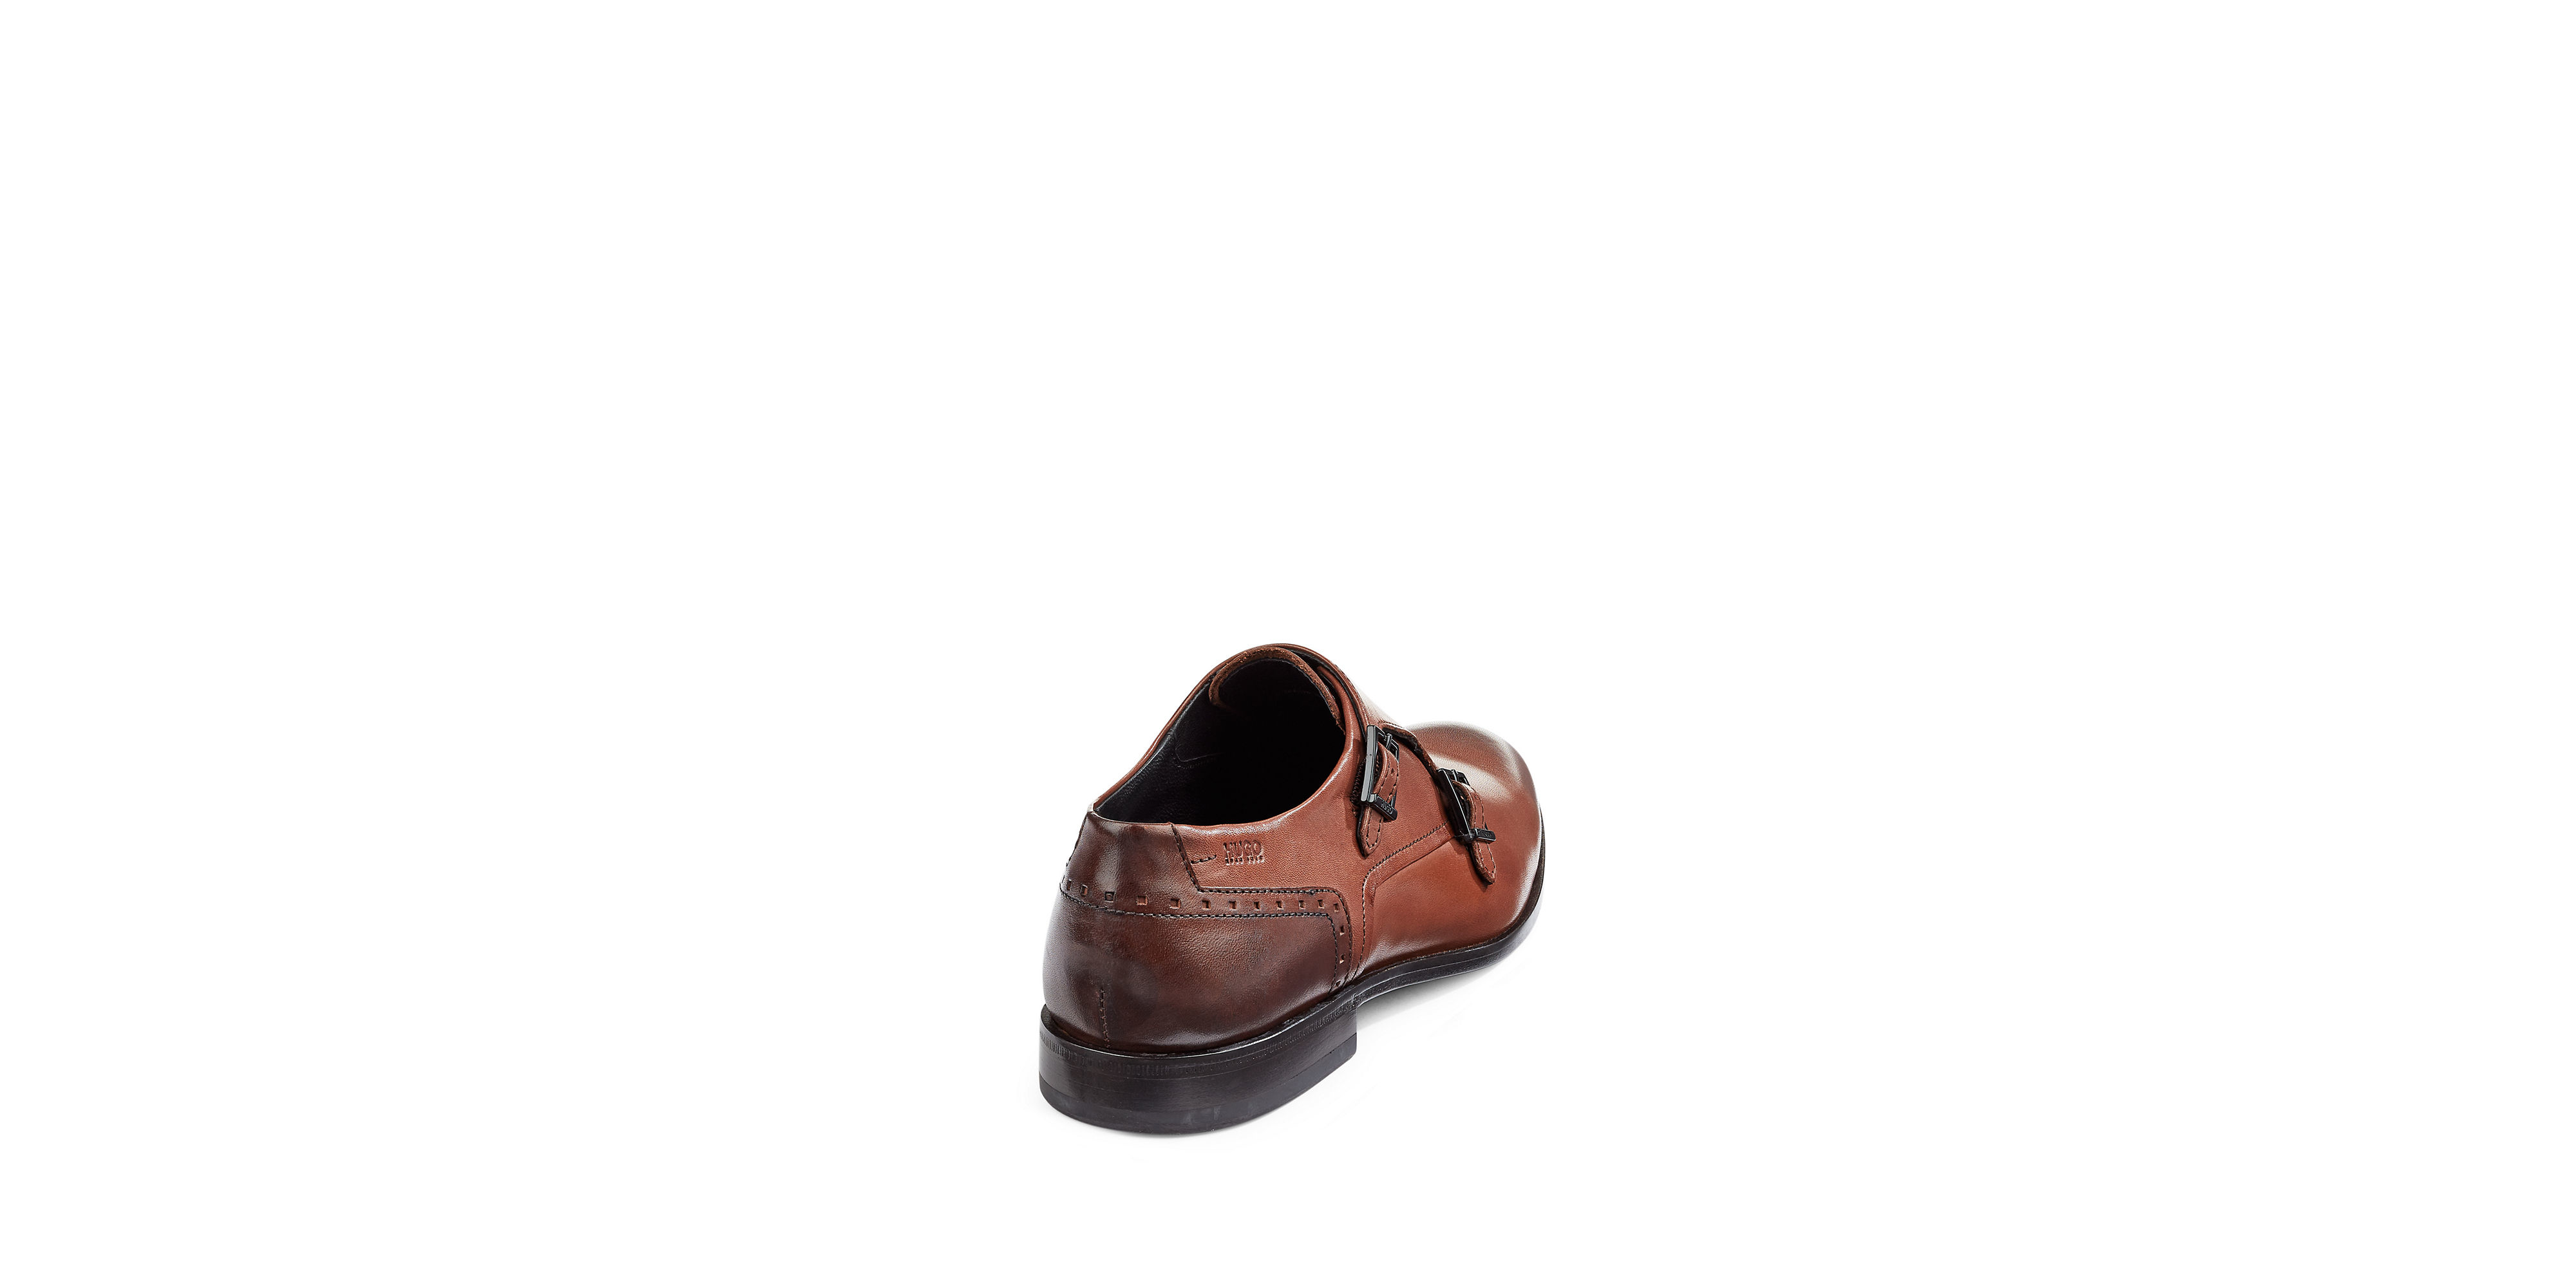 Hudson Bay Shoes Sale